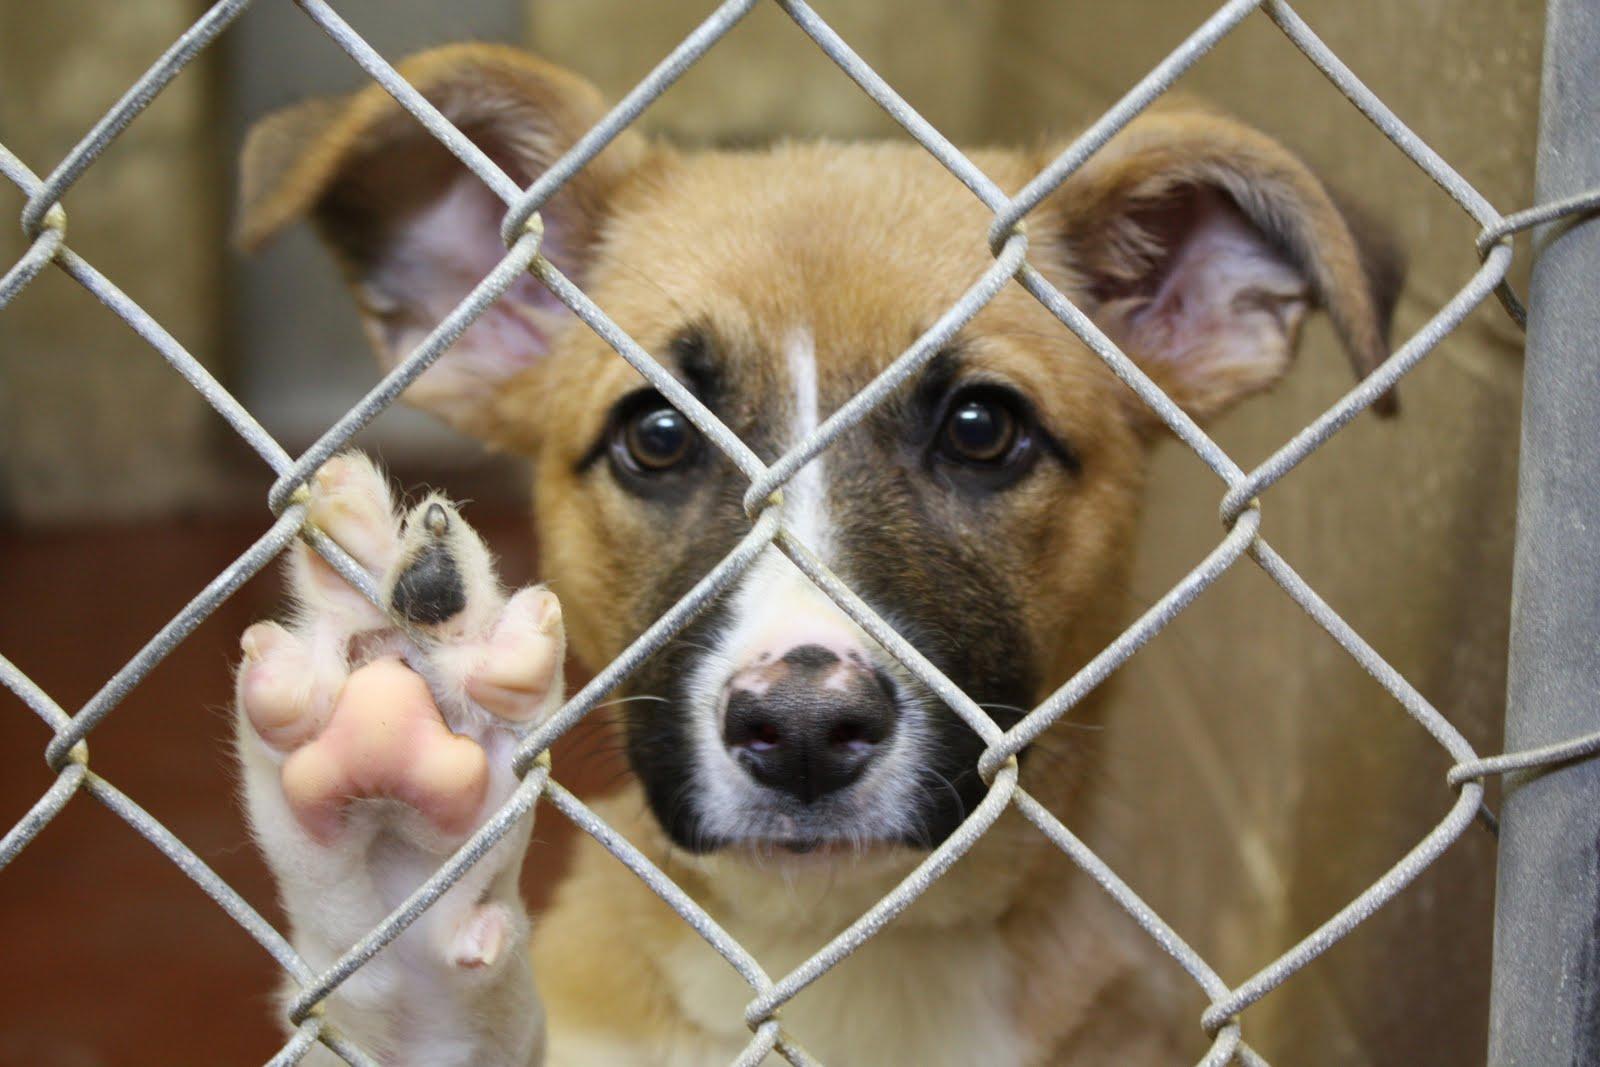 give me shelter capeway veterinary hospital blog capeway